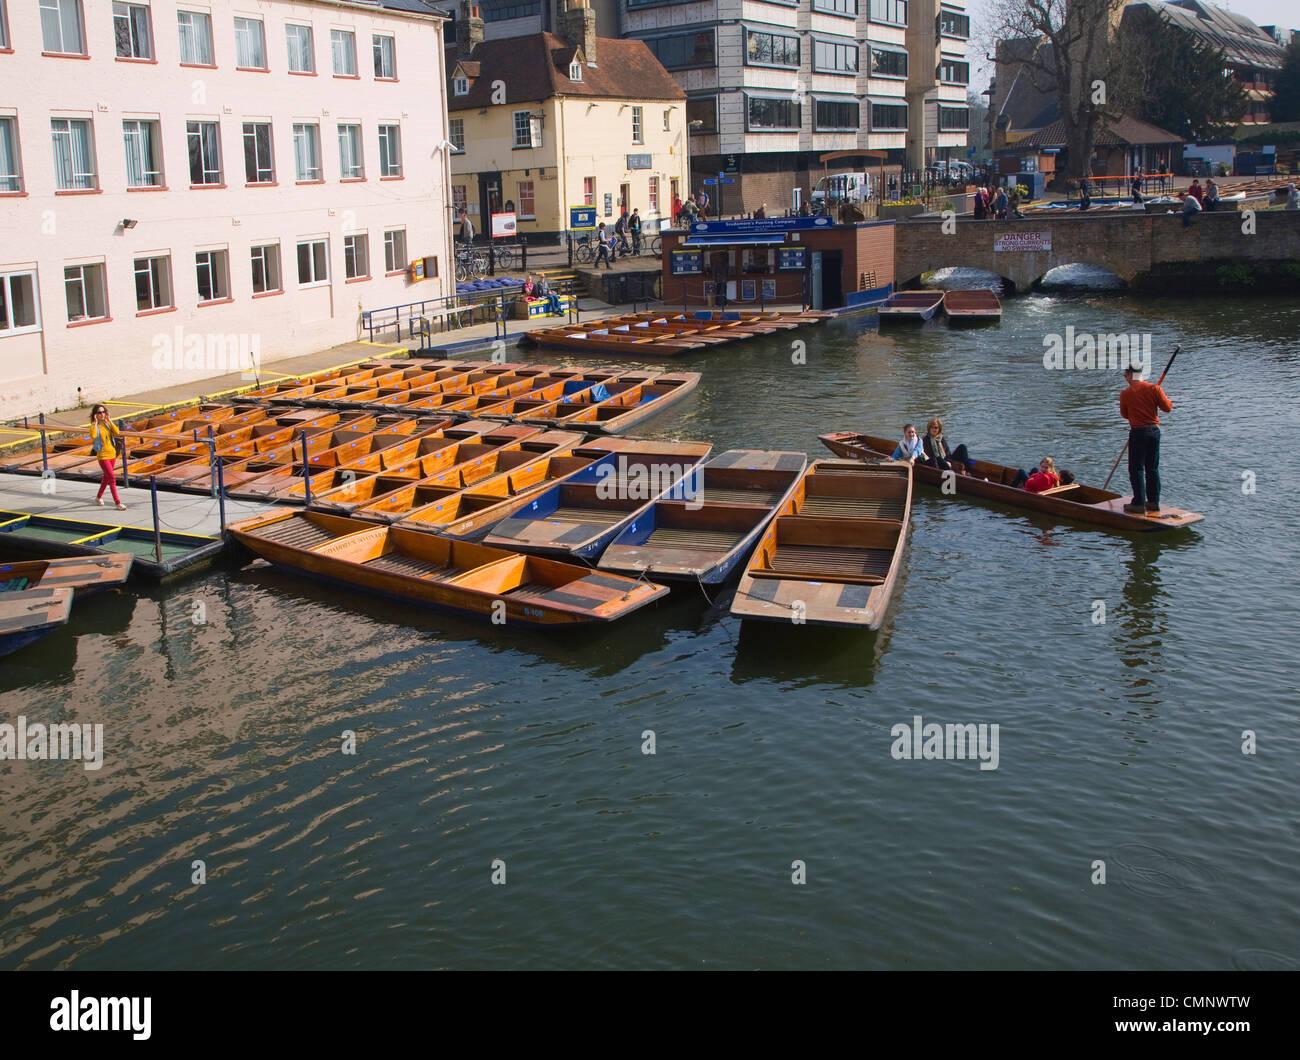 Punts on River Cam, Cambridge, England Stock Photo